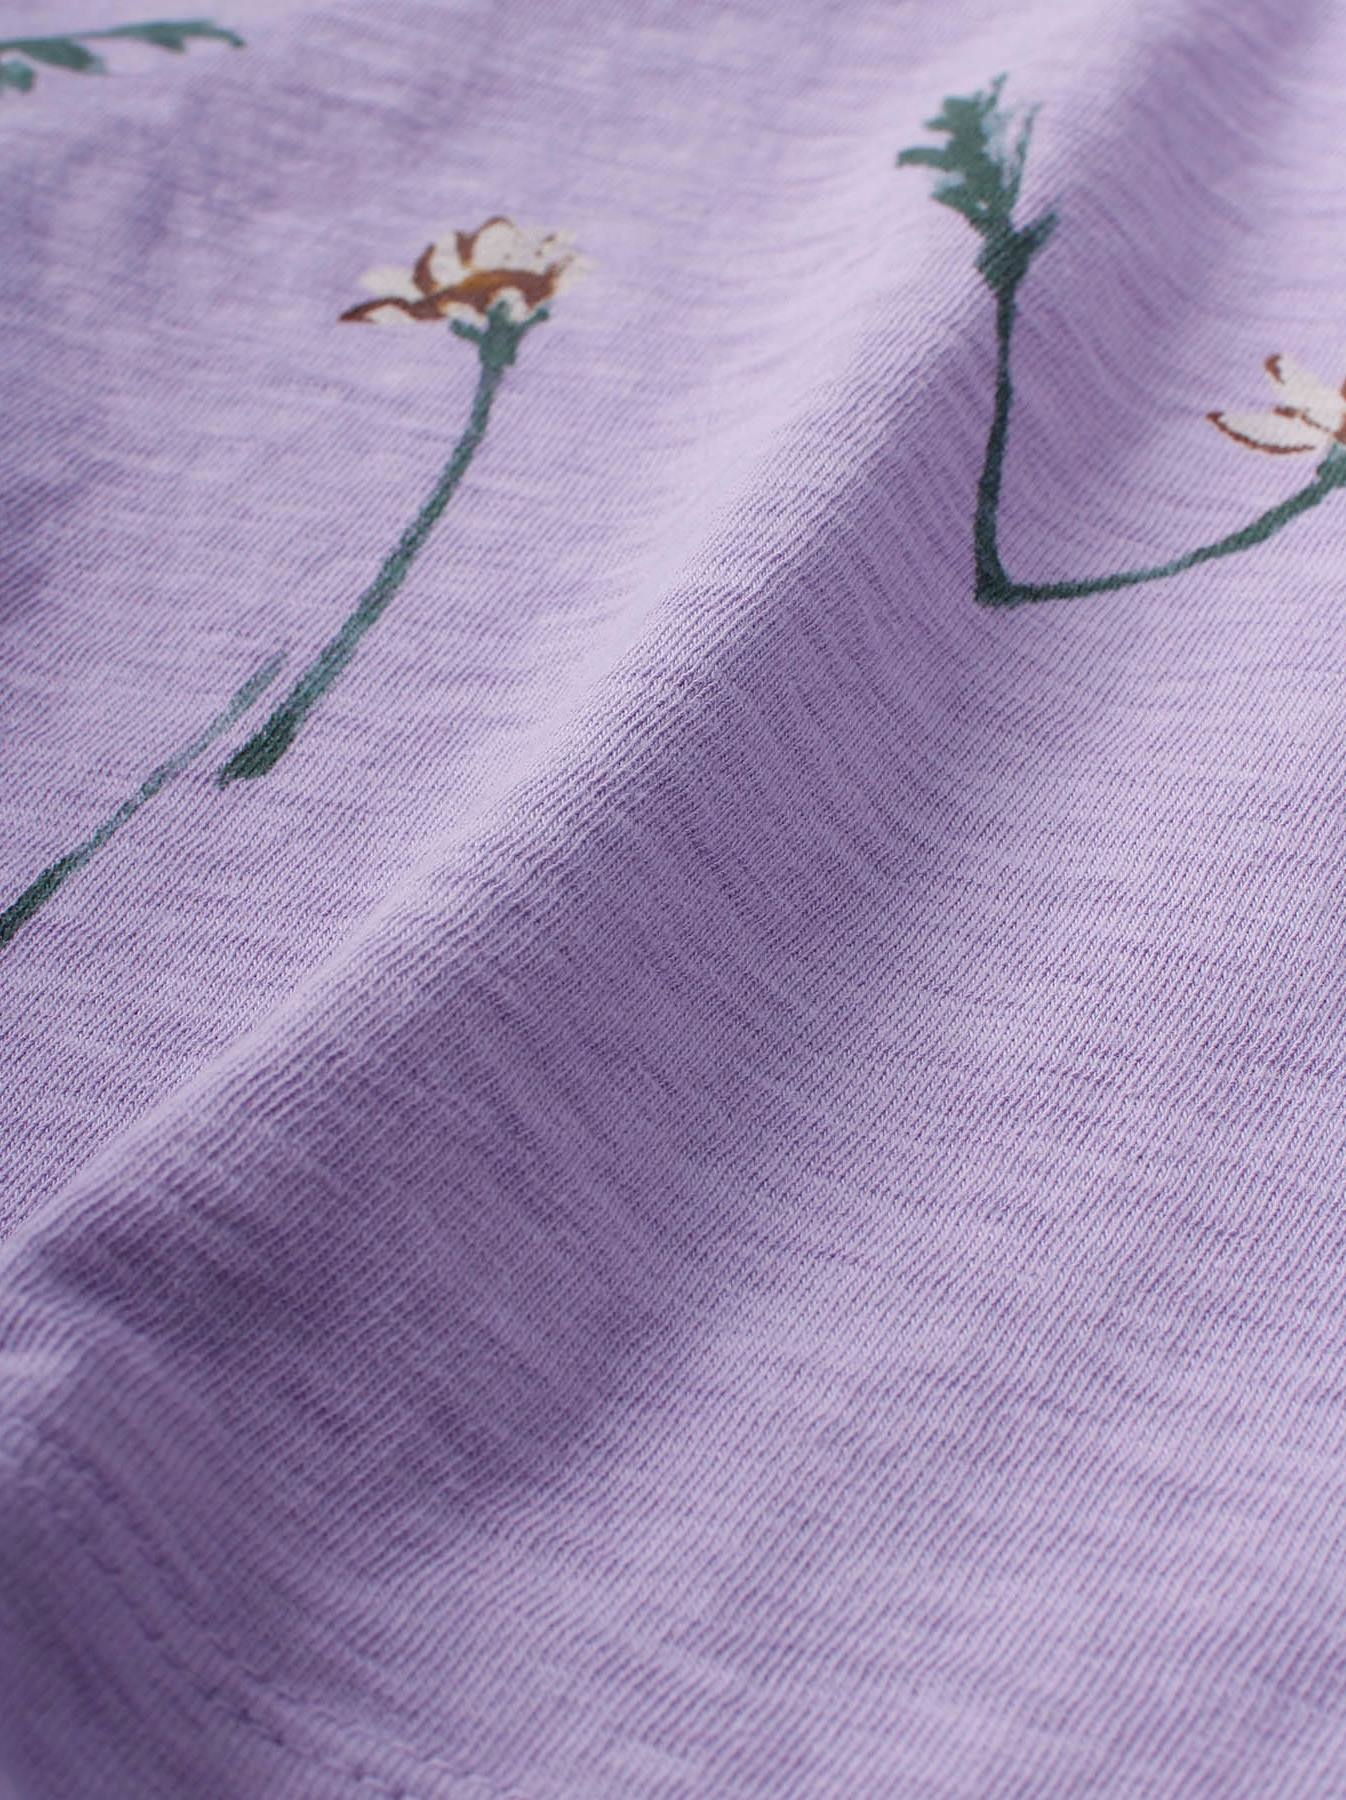 WH 45 Star T-shirt (Flower Logo)-9